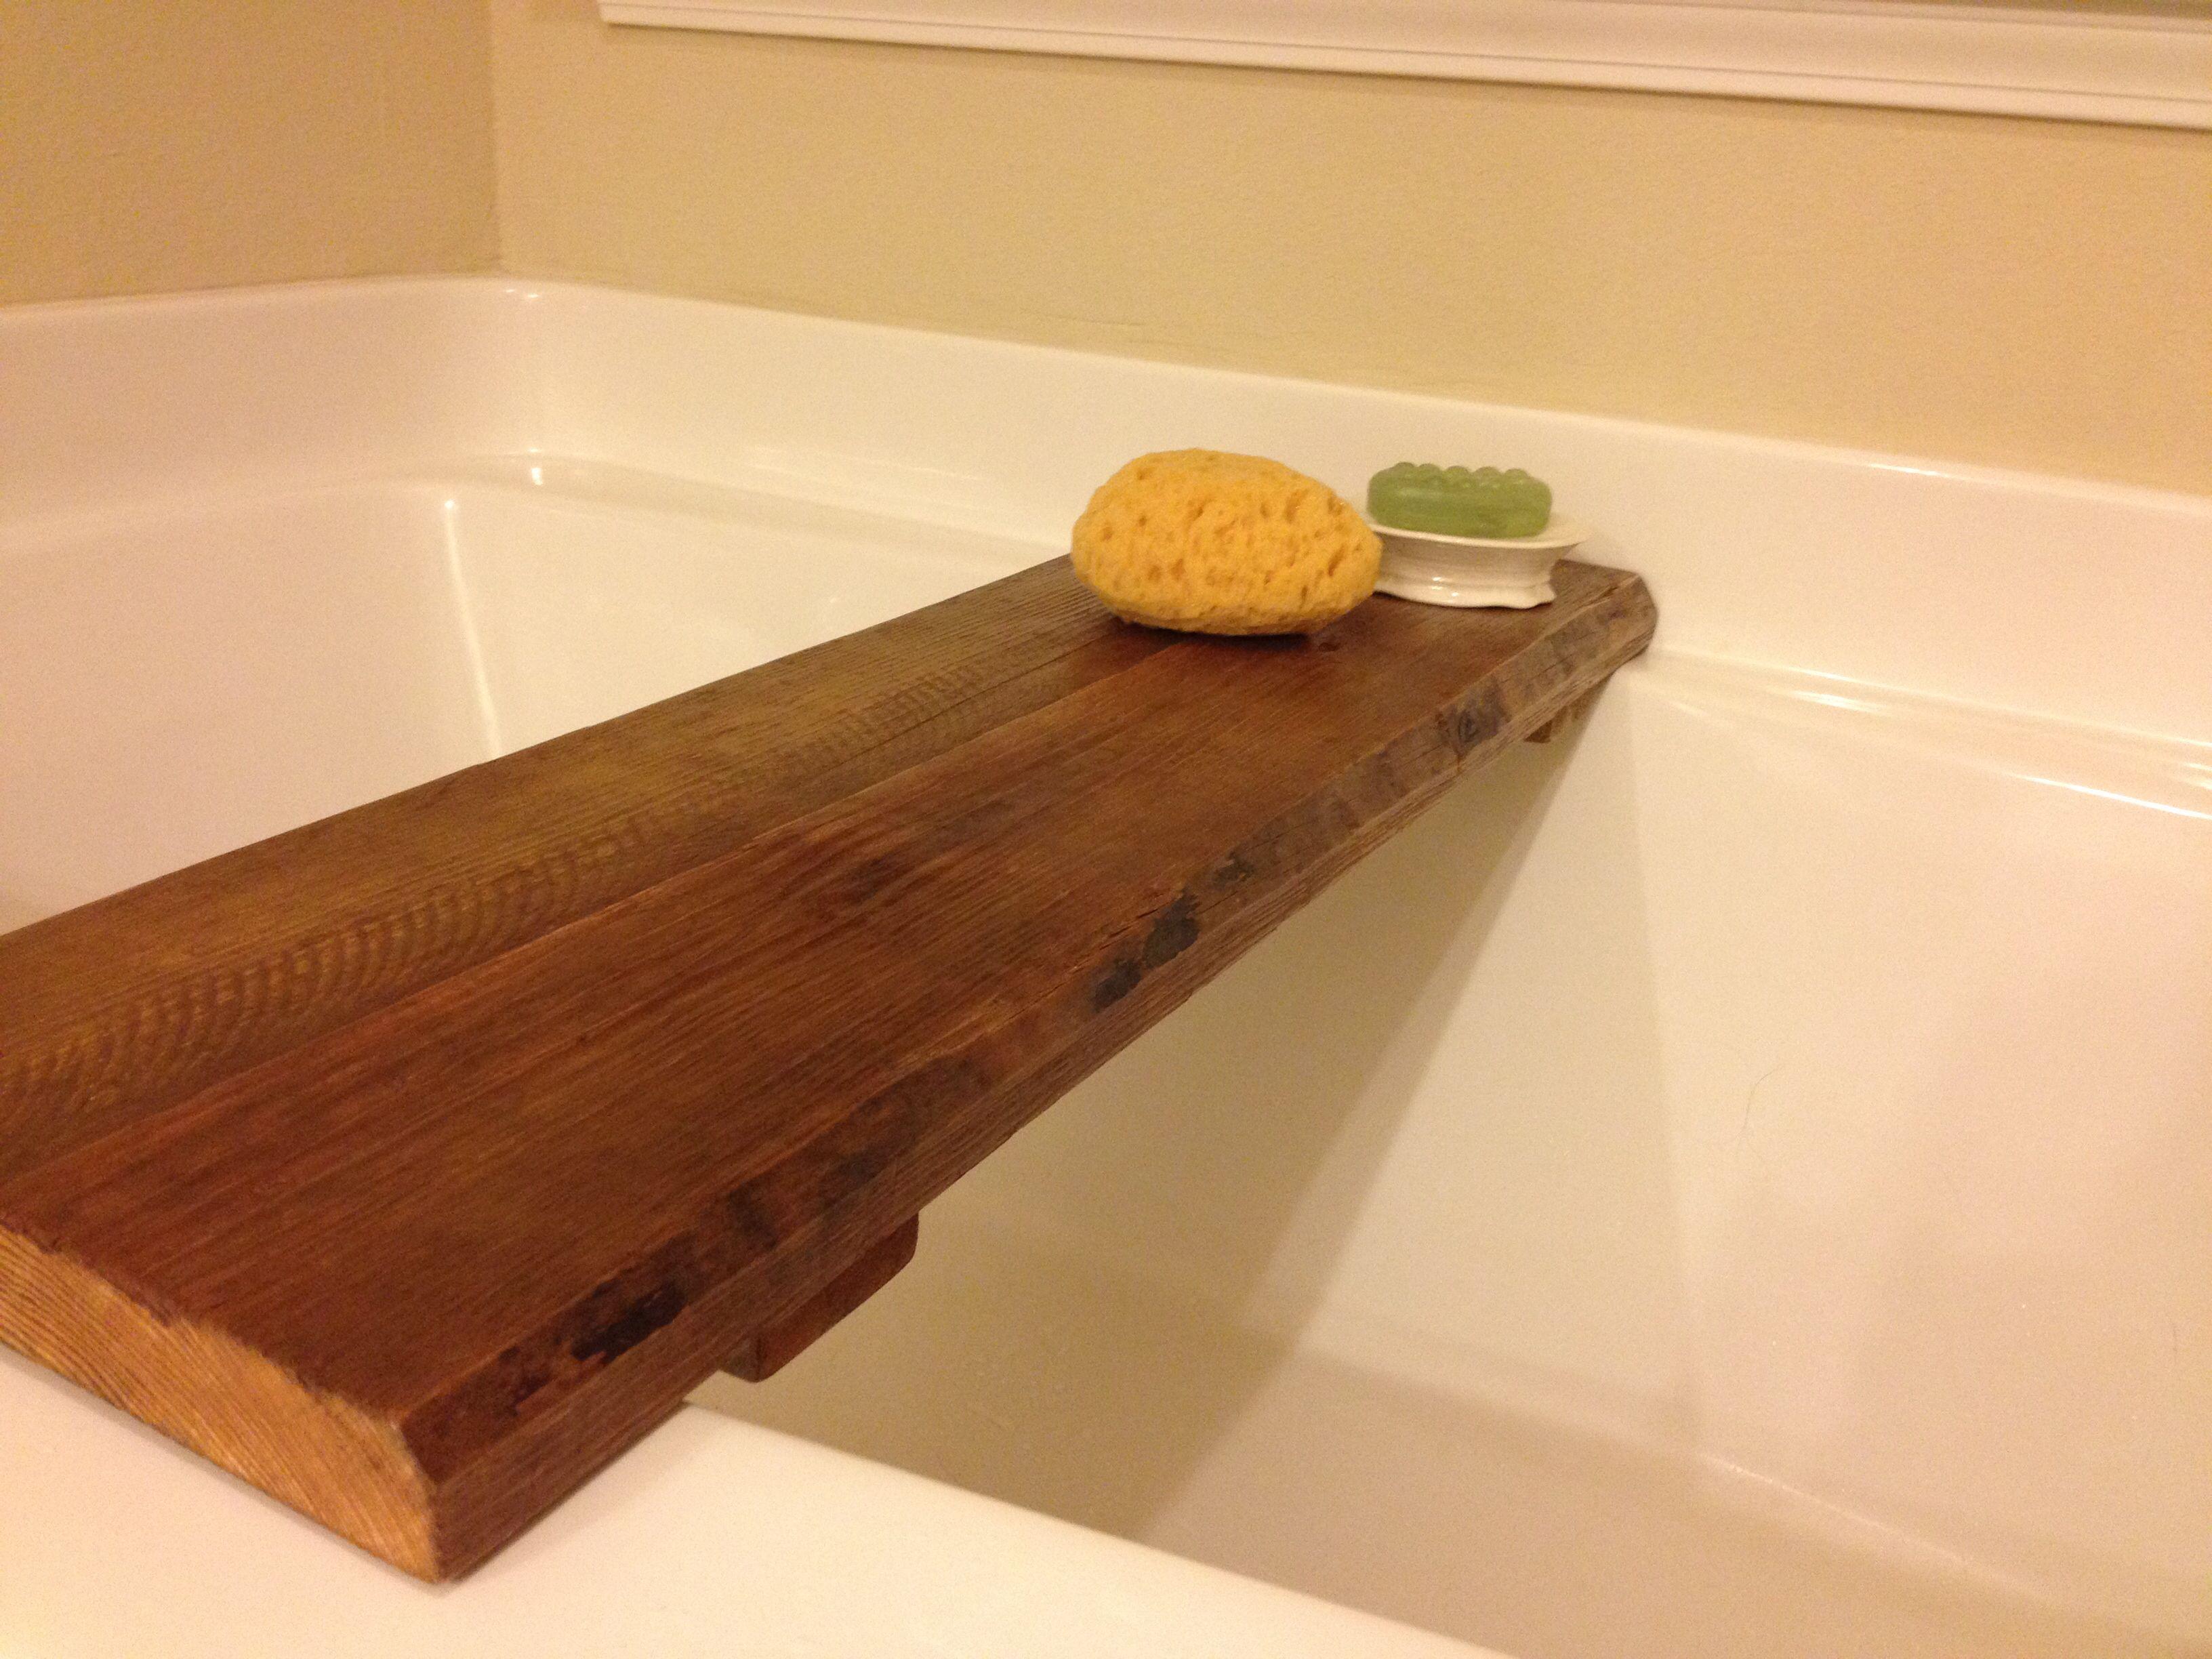 DIY bath tub tray | Casa Bonita | Pinterest